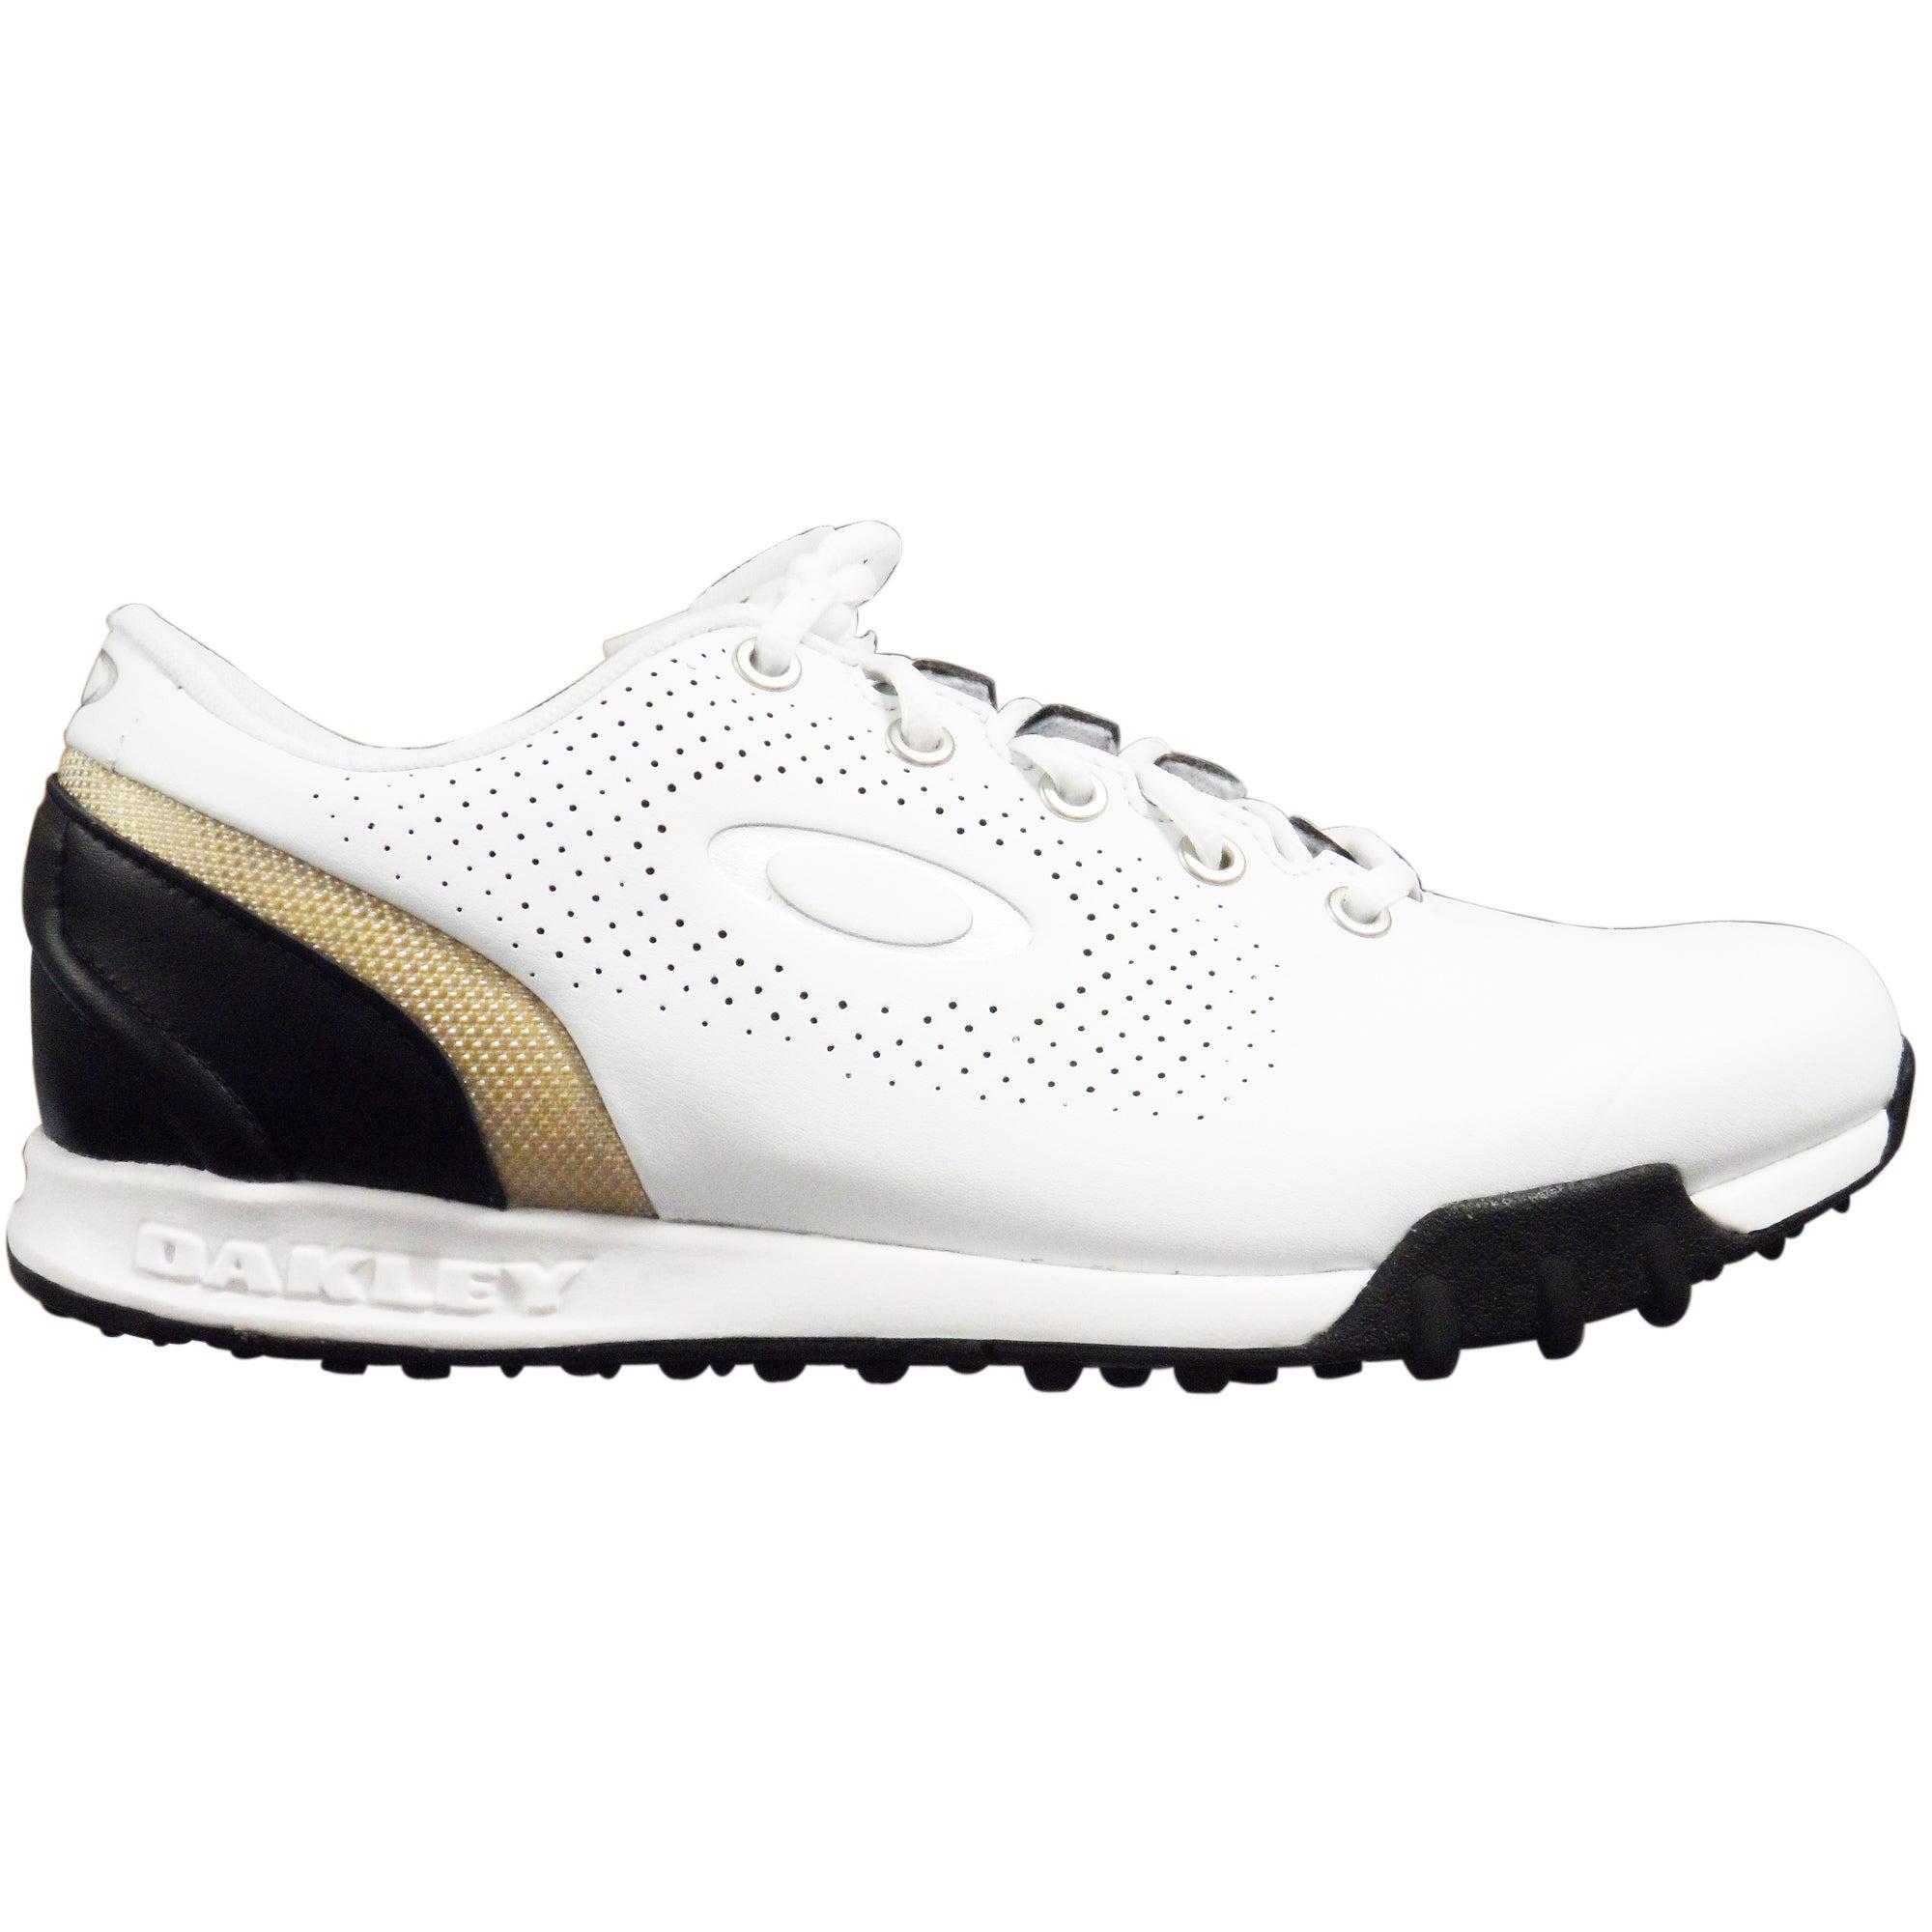 Adidas Innolux 2 0 Golf Shoes Adidas Men 39 s Brown Innolux 2 0